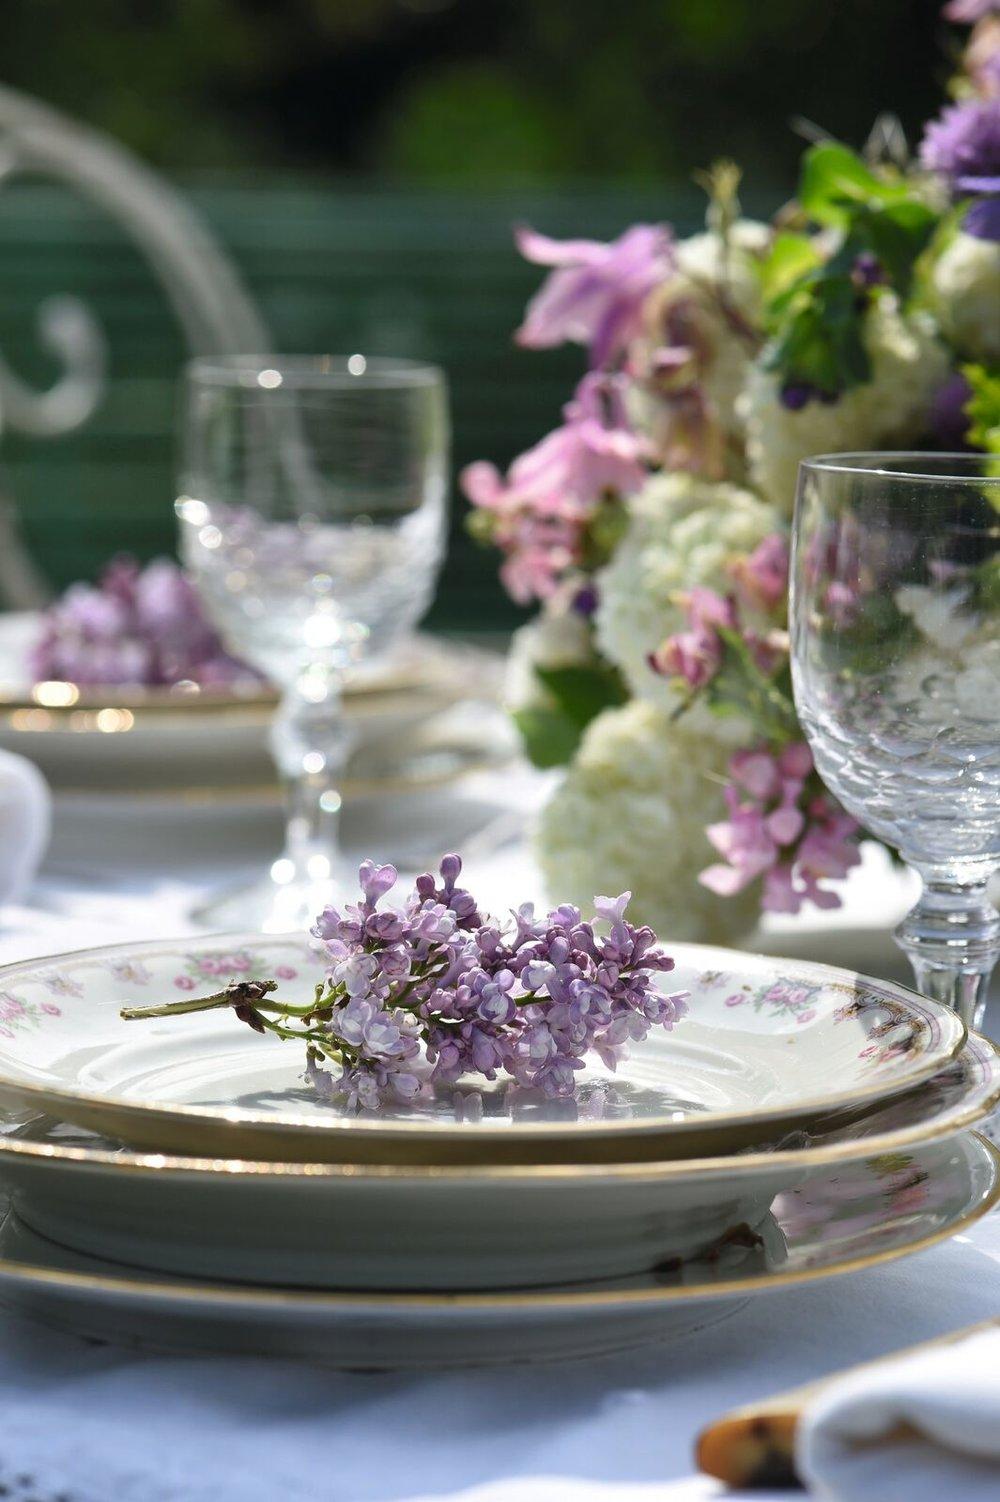 sharon-santoni-hospitality-les-fleurs.jpg